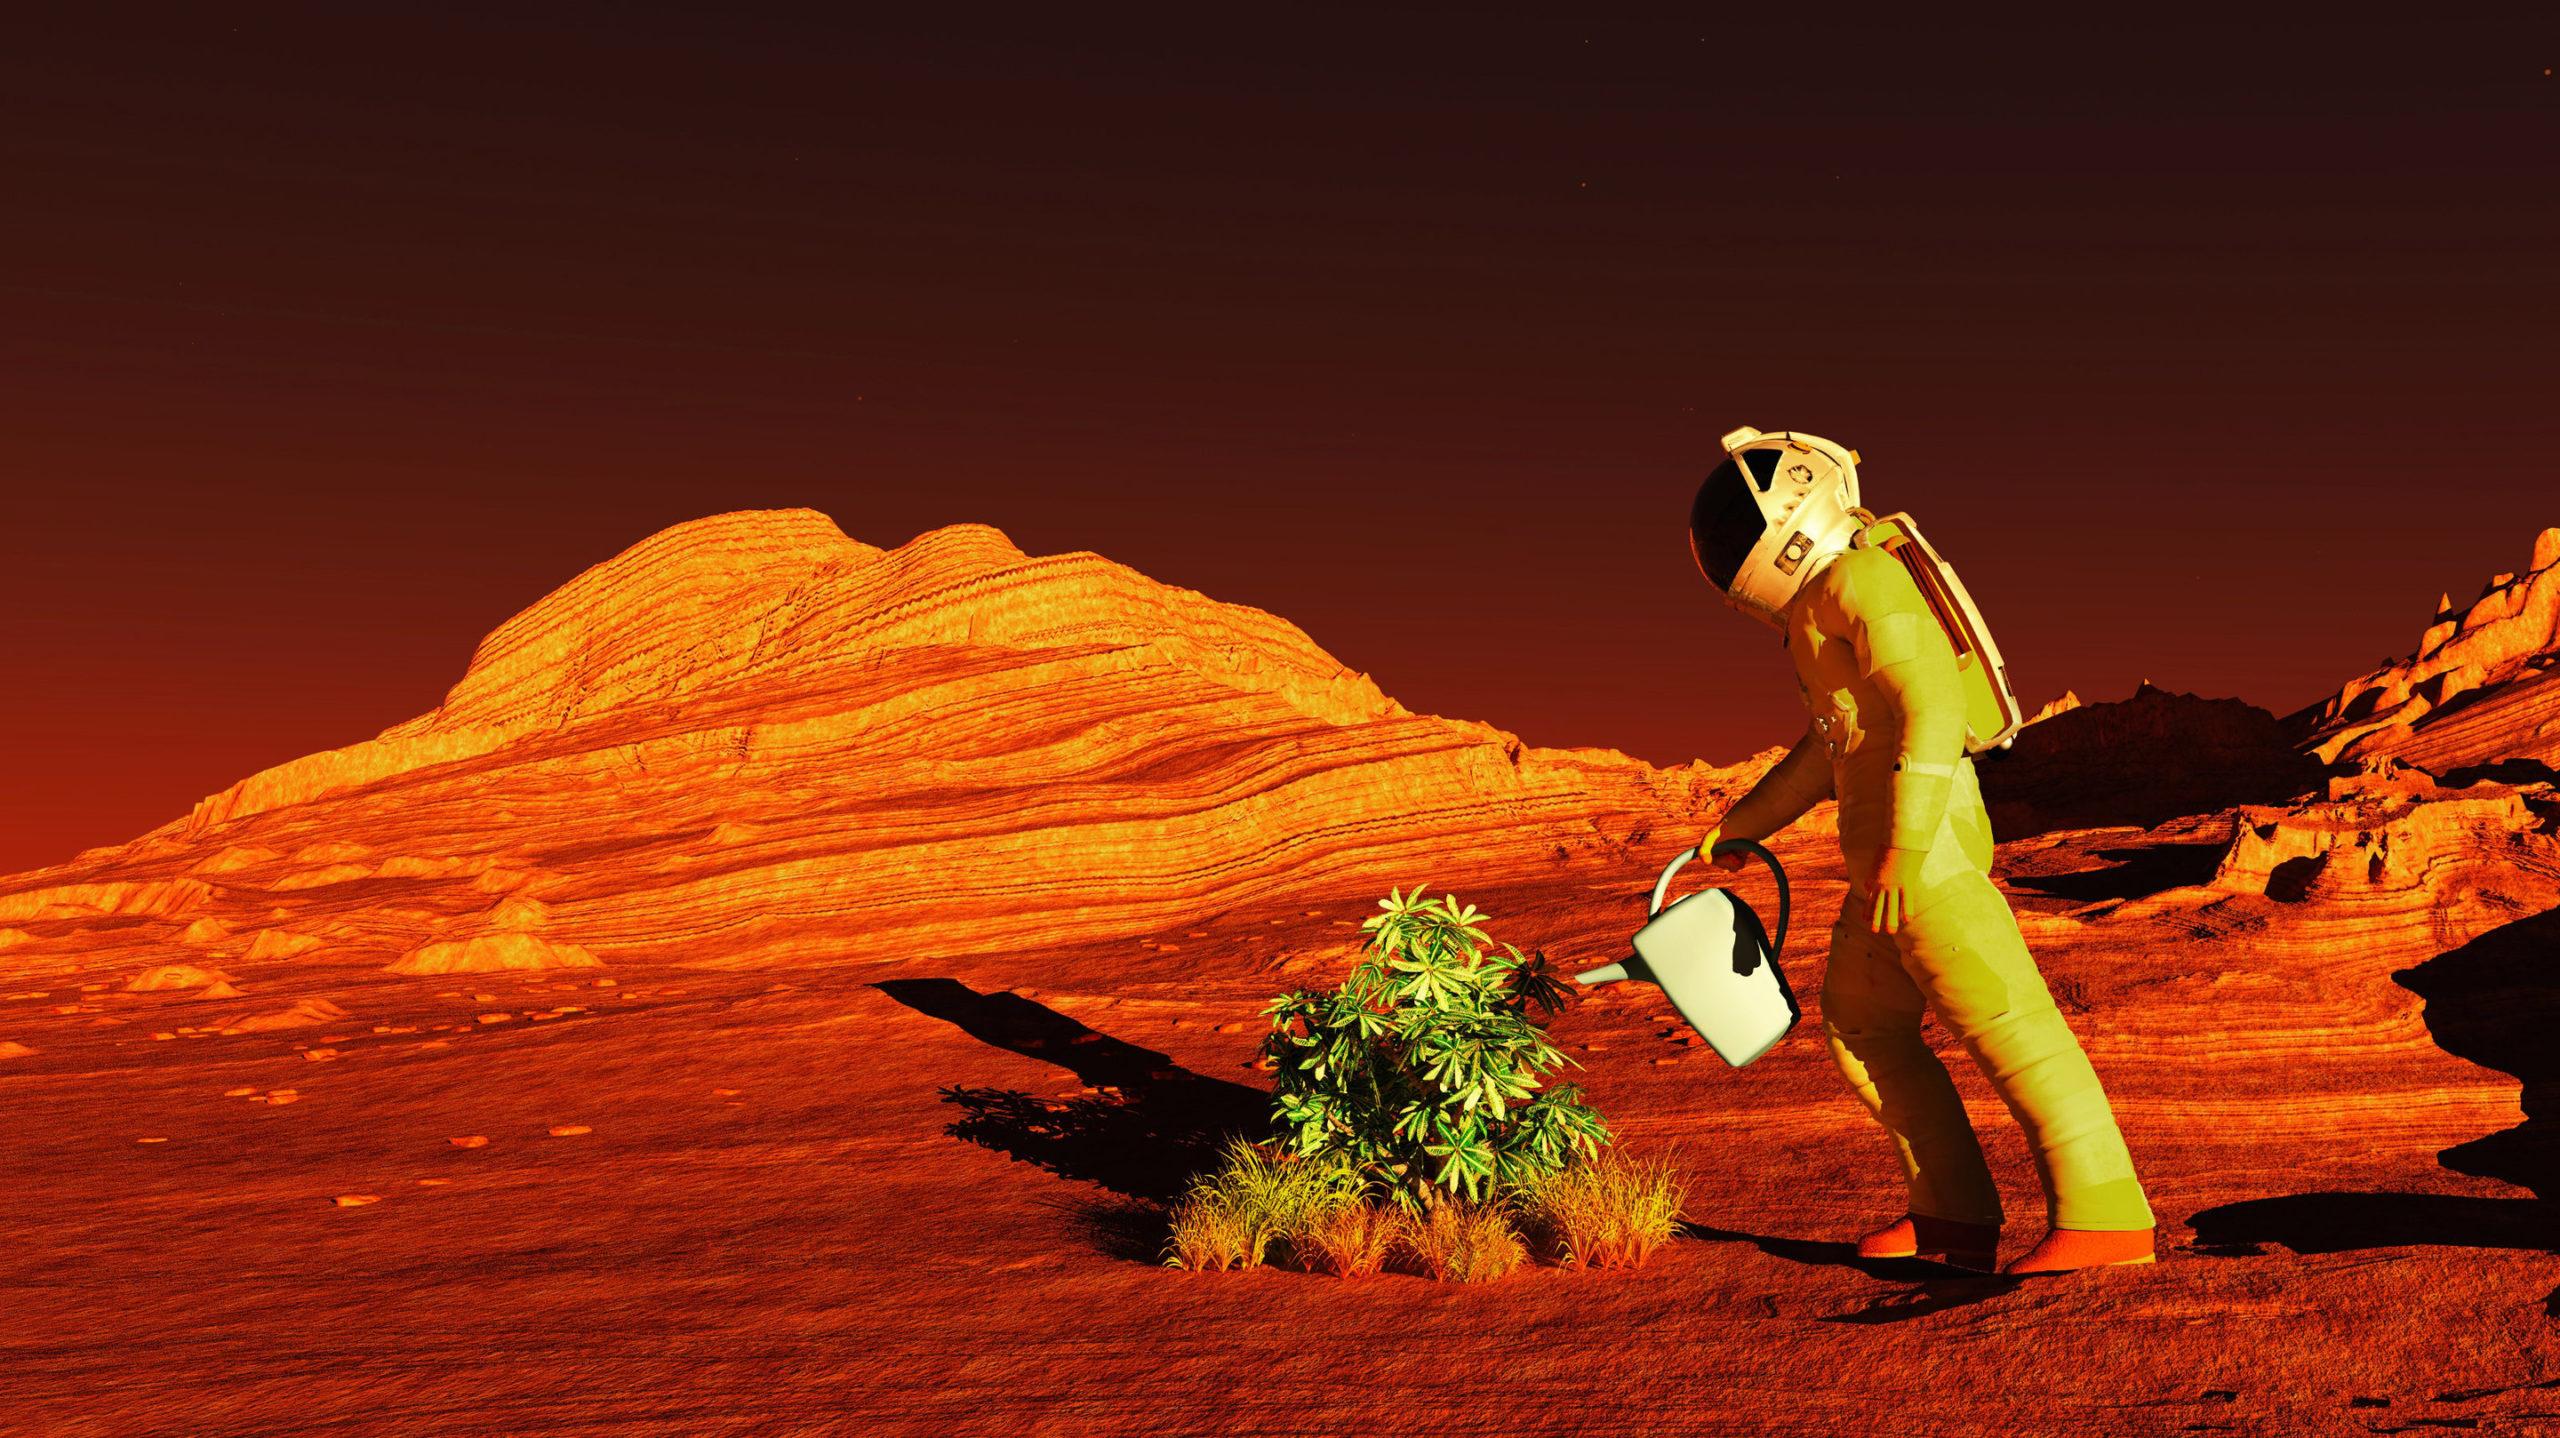 Growing crops on Mars